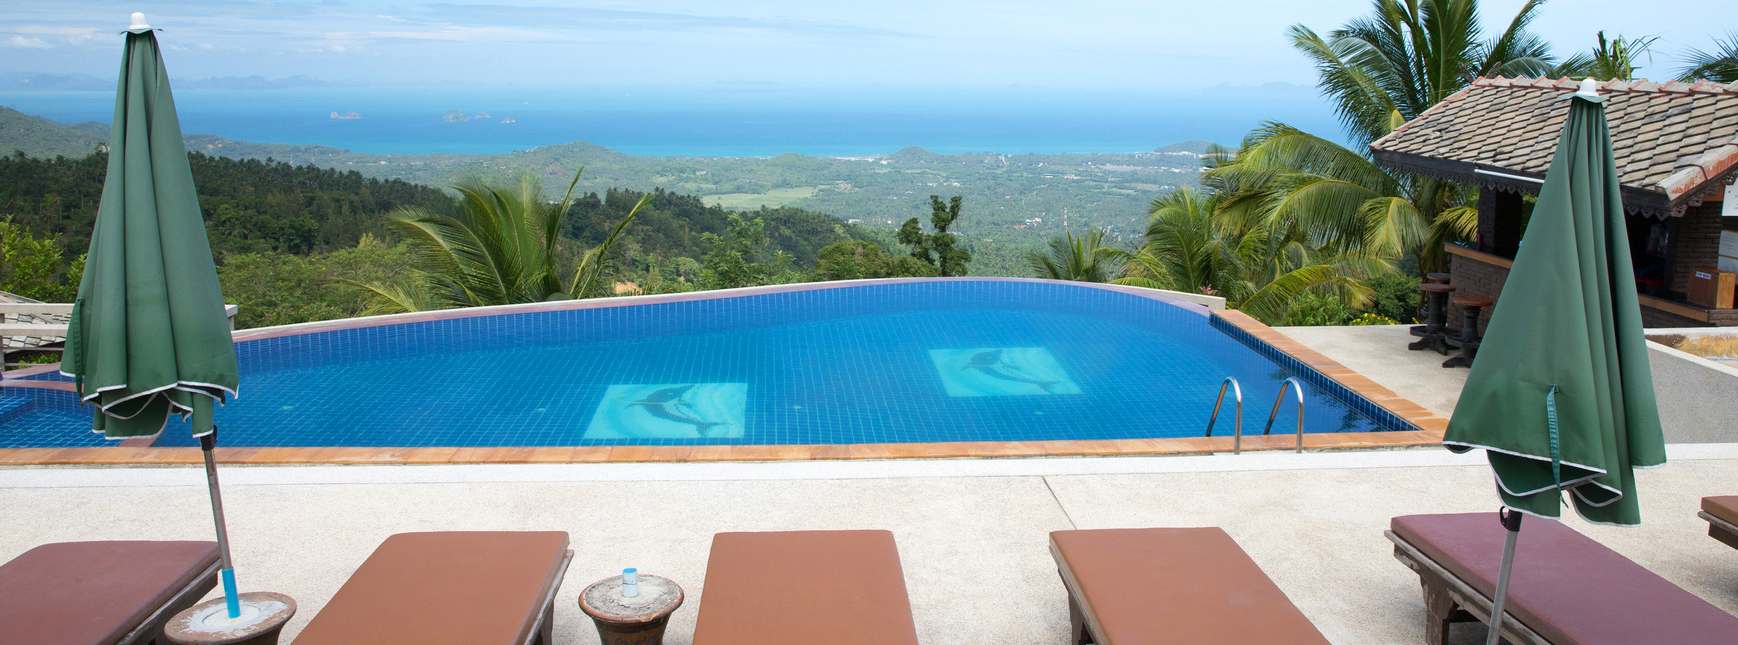 Photodune 5658690 Pool M Swim Care Pool Services